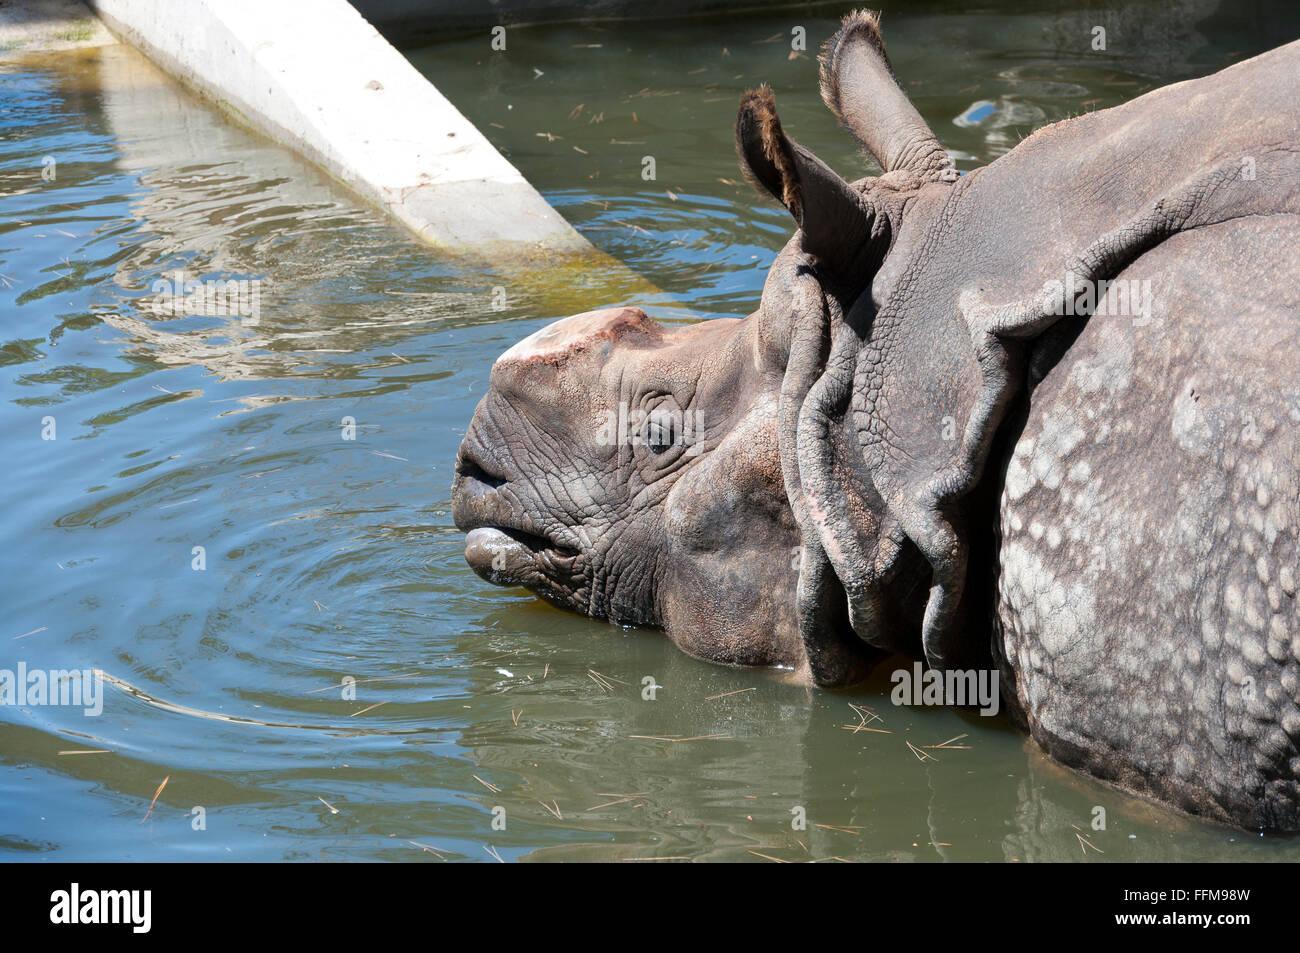 One-horned rhinoceros, Rhinocerotidae unicornis - Stock Image